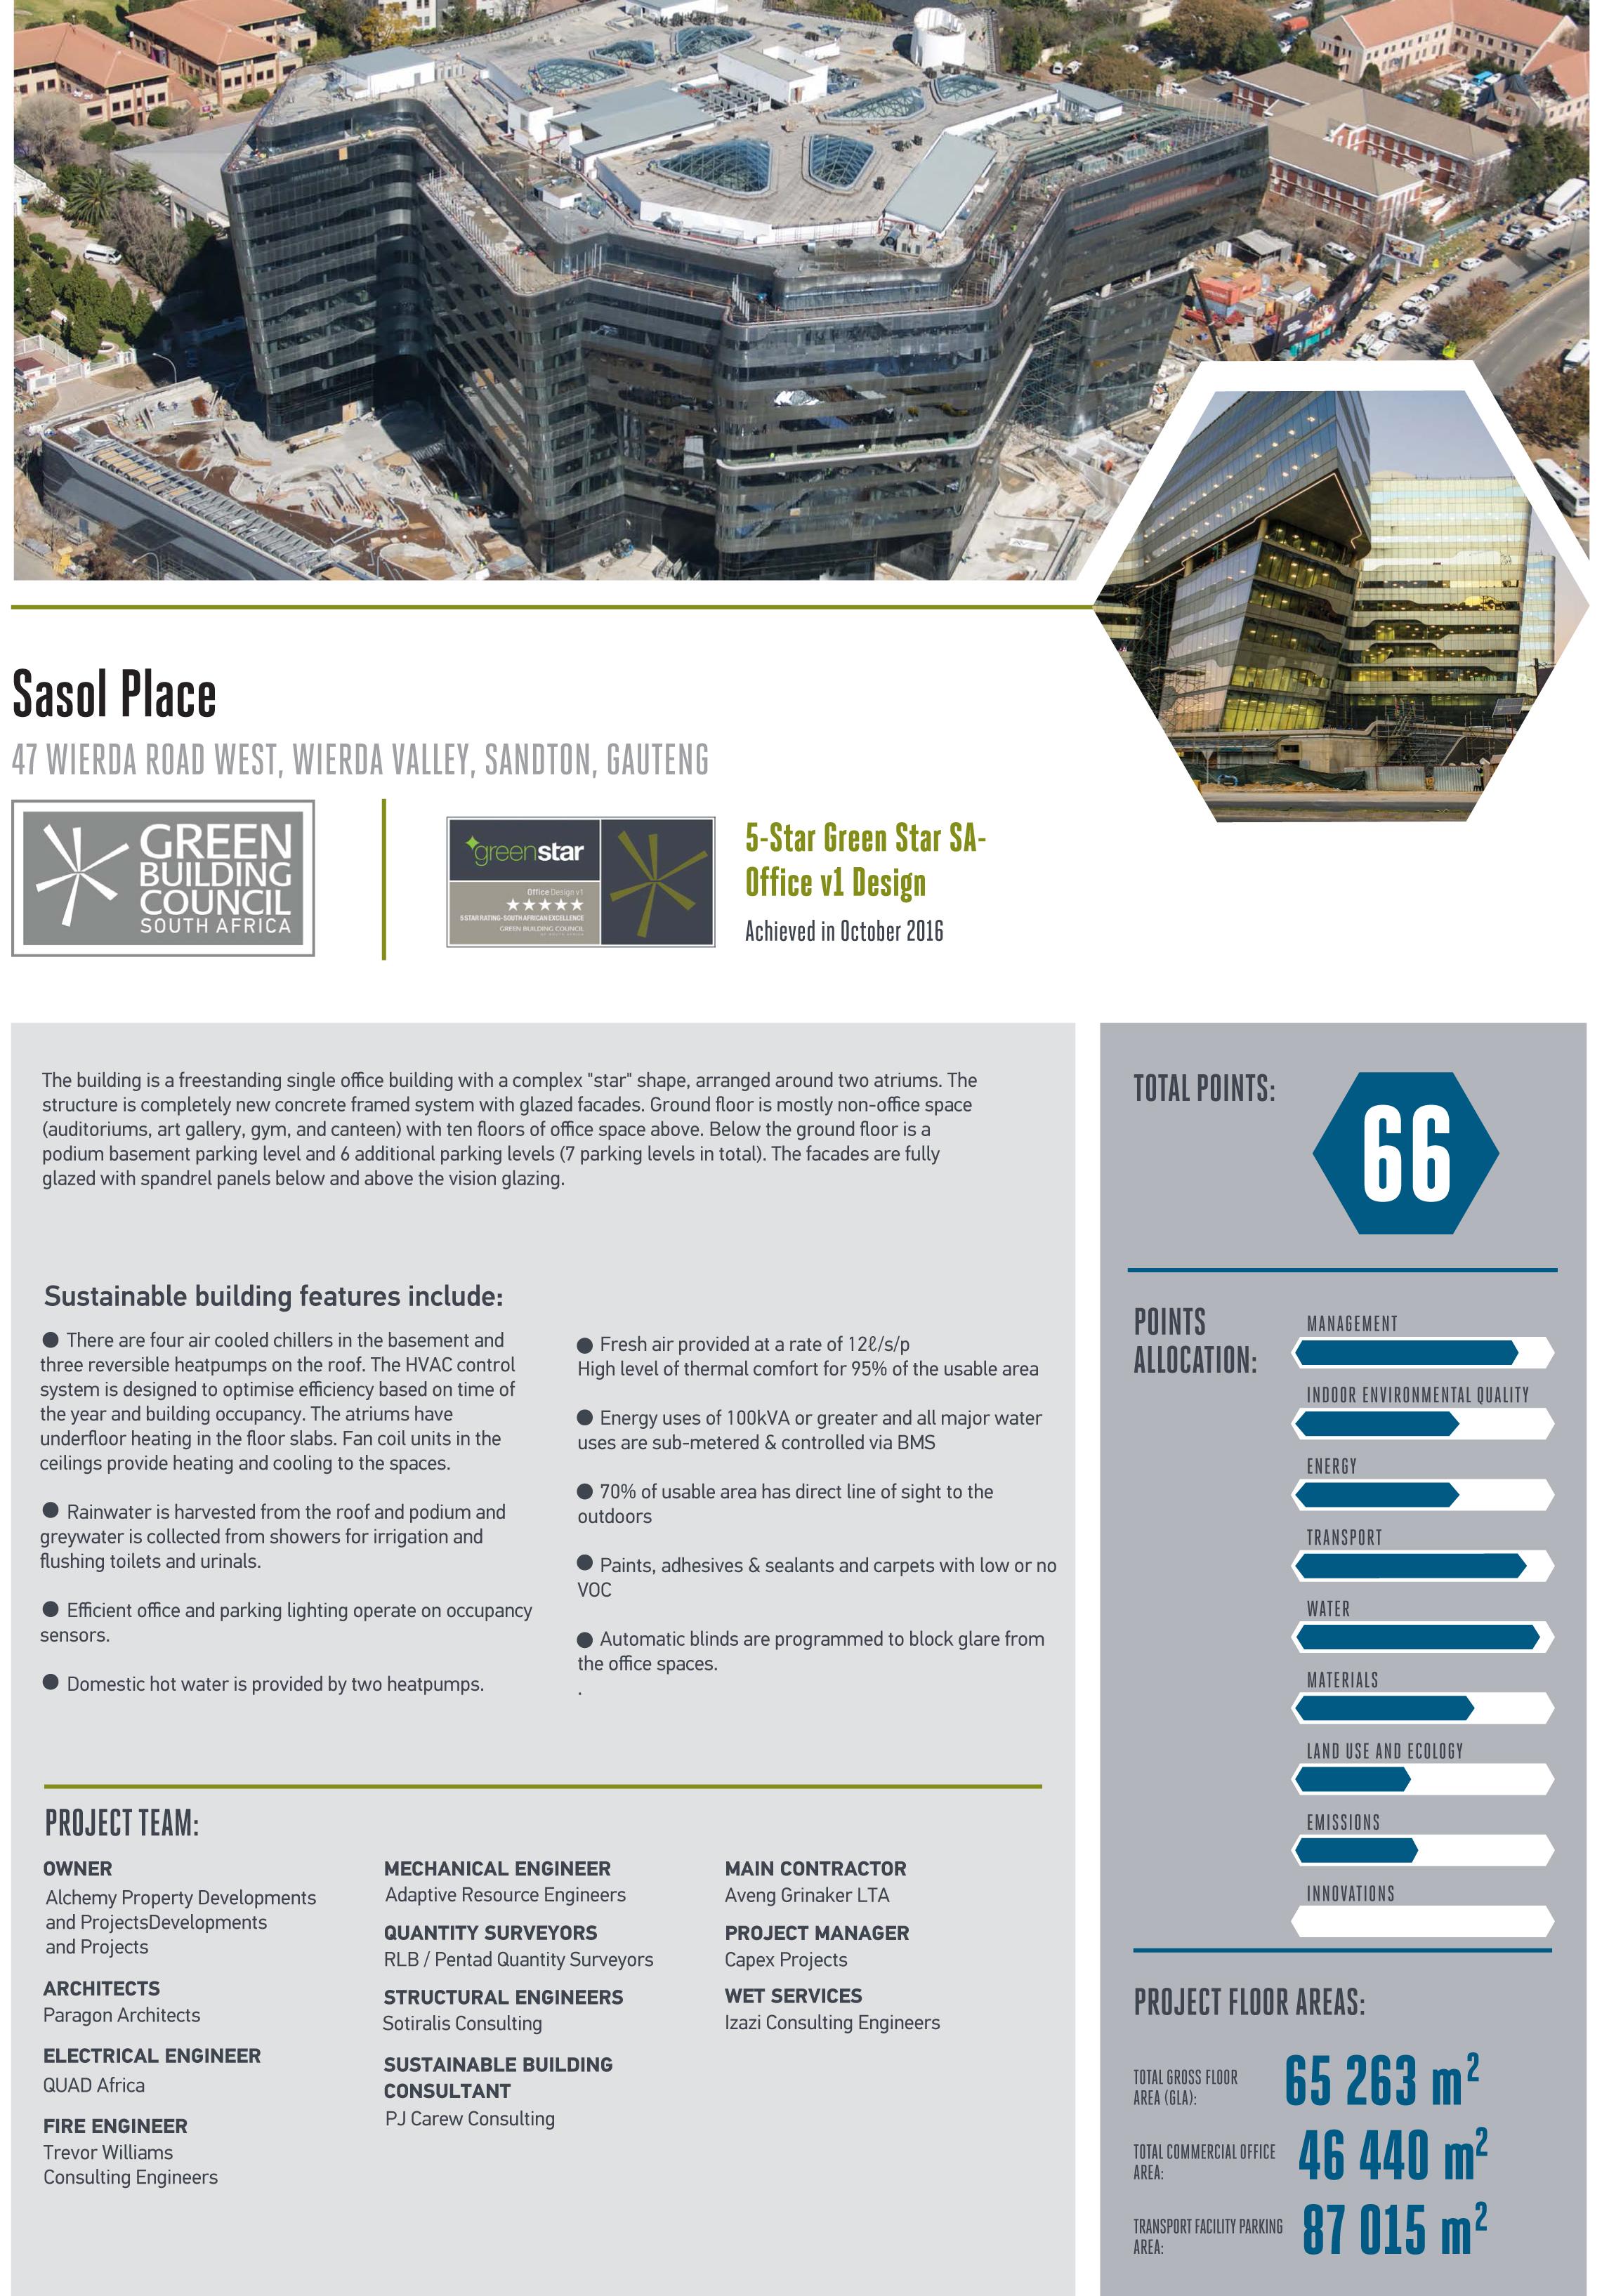 Sasol Place Receives its GBCSA rating